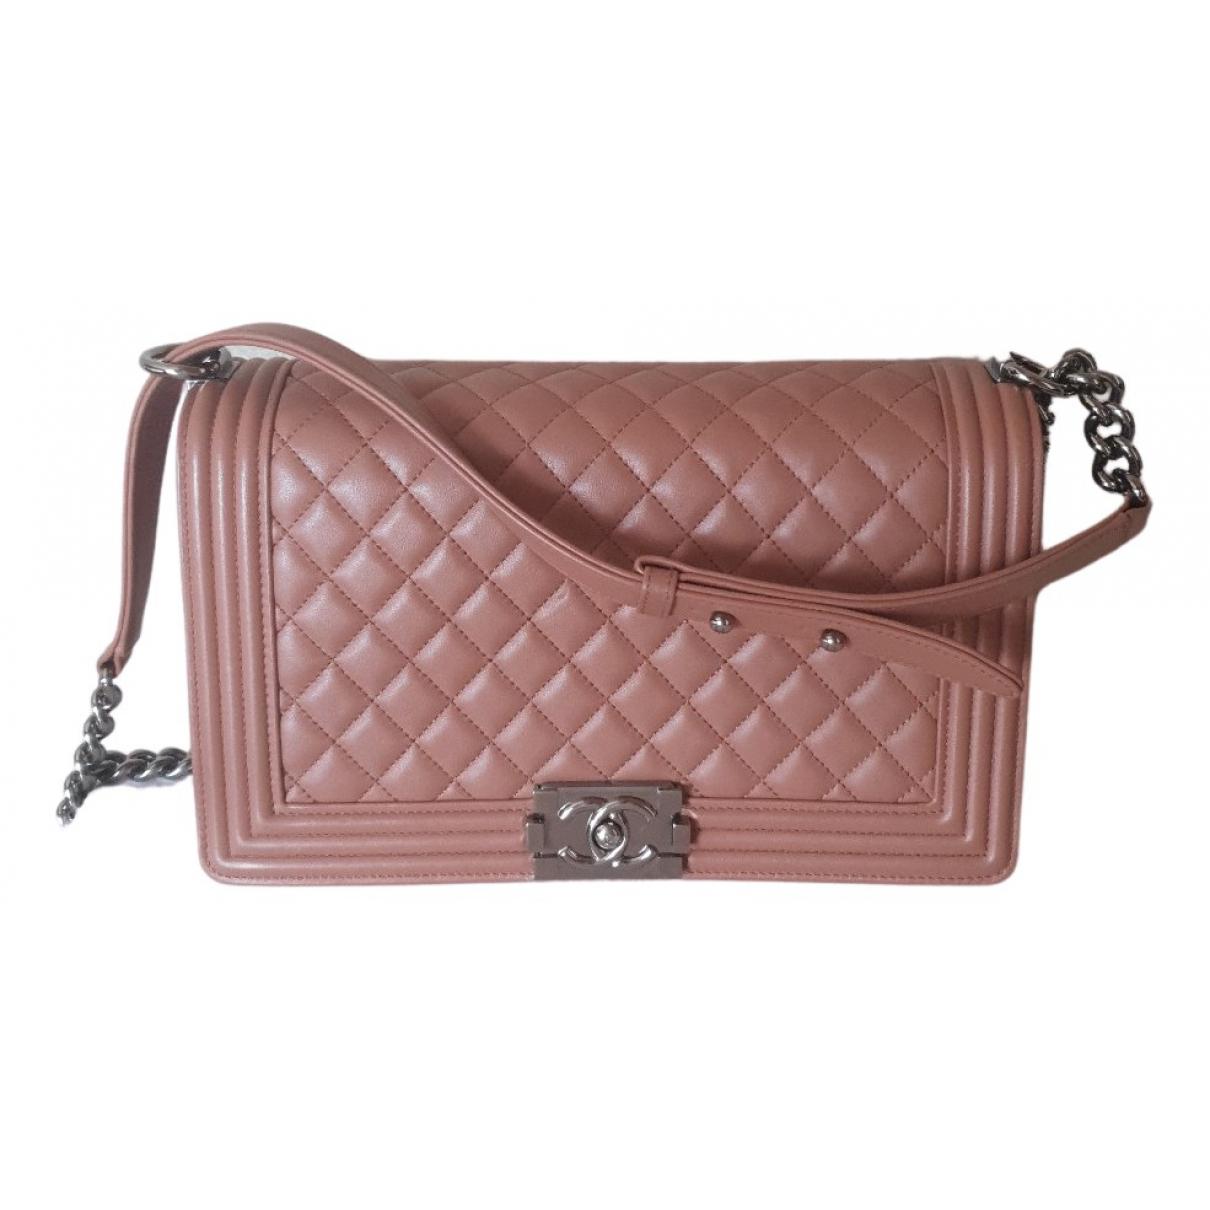 Chanel Boy Brown Leather handbag for Women N